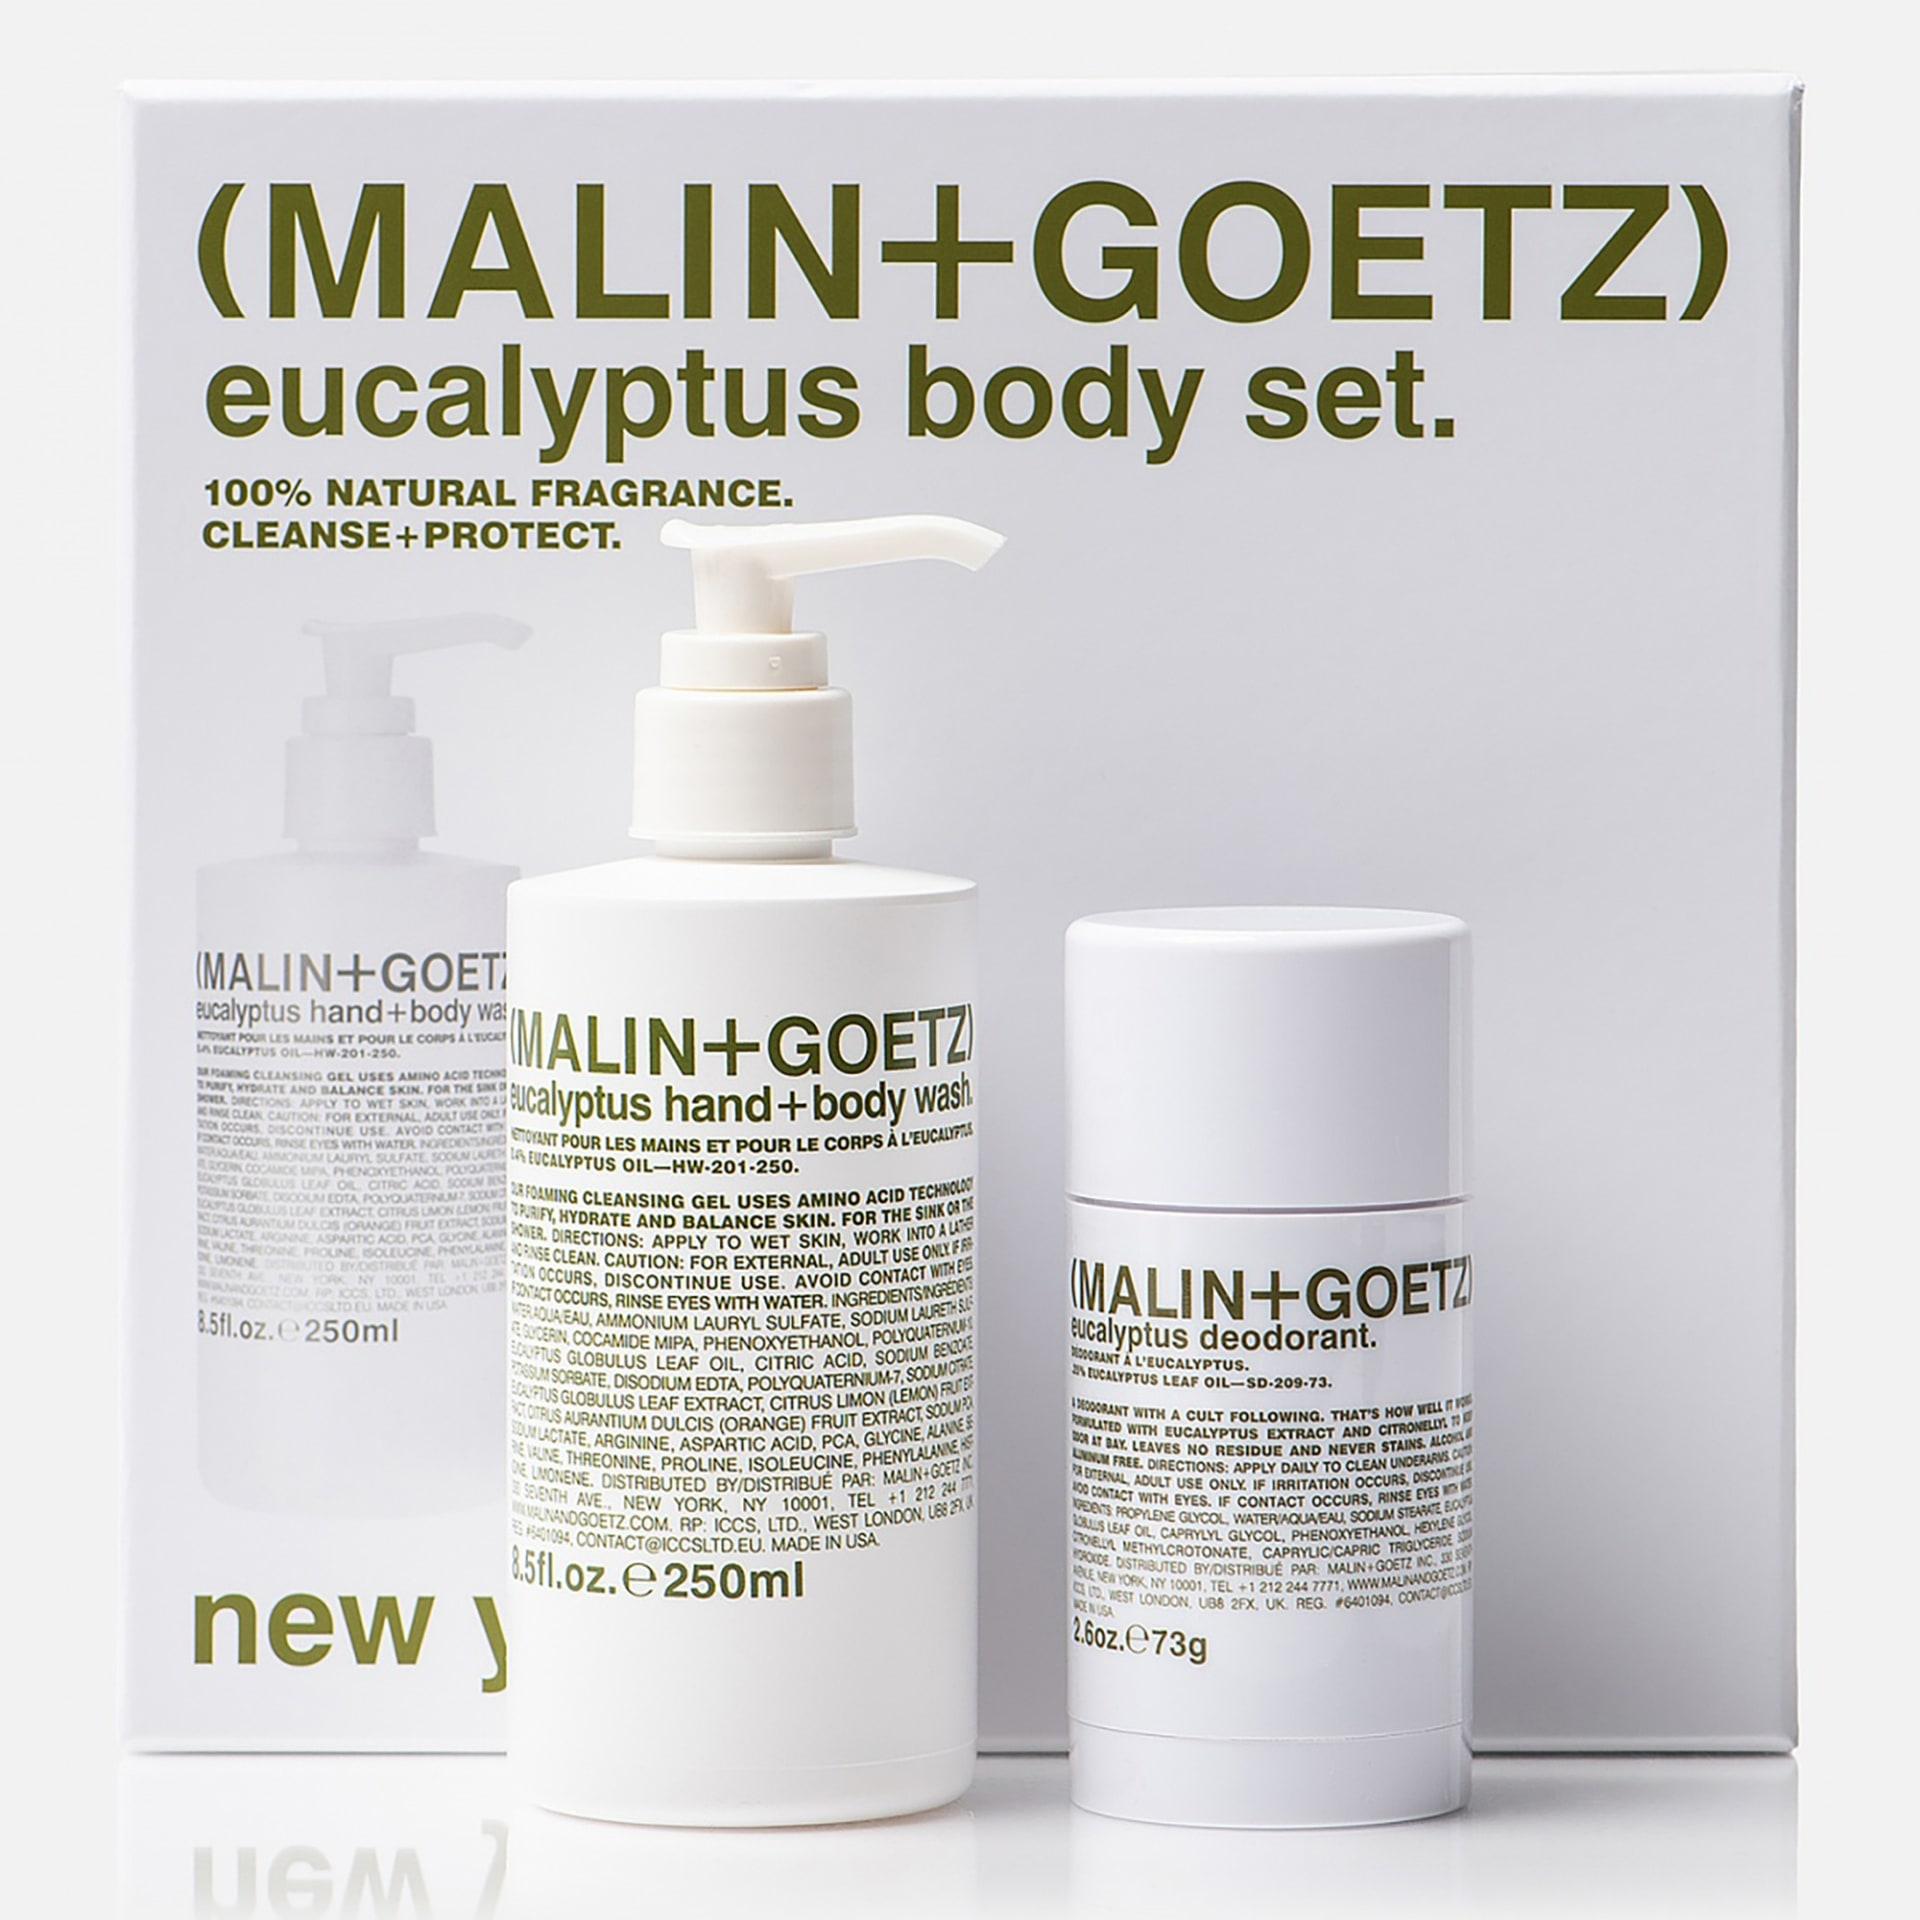 malin-goetz-eucalyptus-body-set